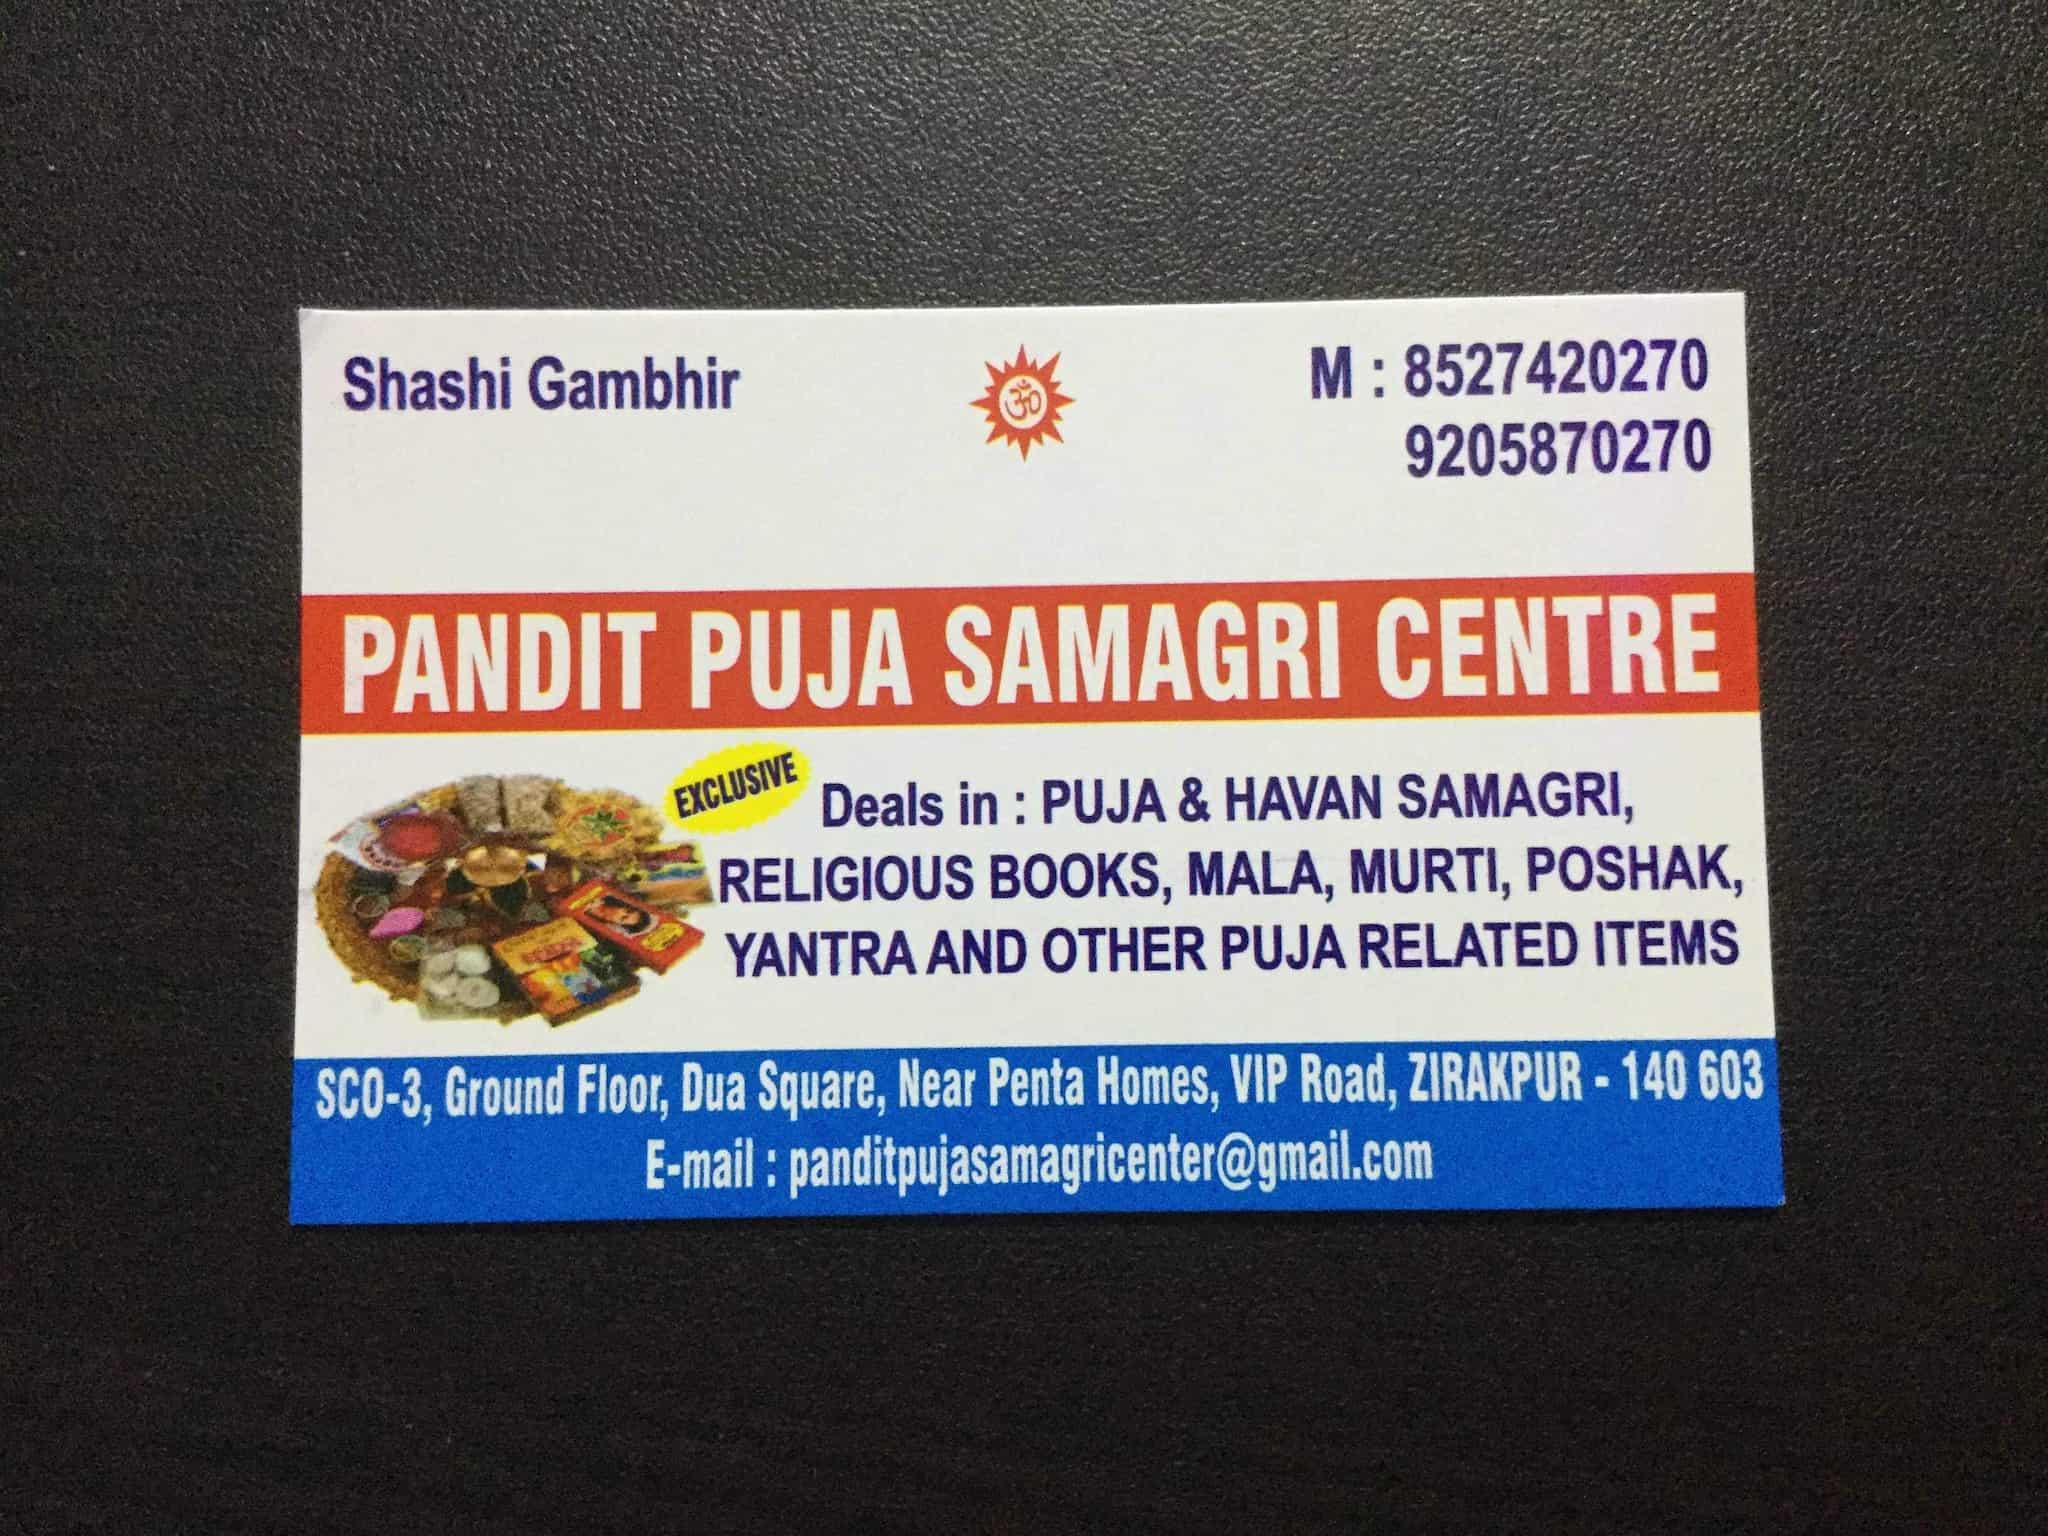 Pandit Puja Samagri Centre, Near Penta Homes - Agarbatti Dealers in